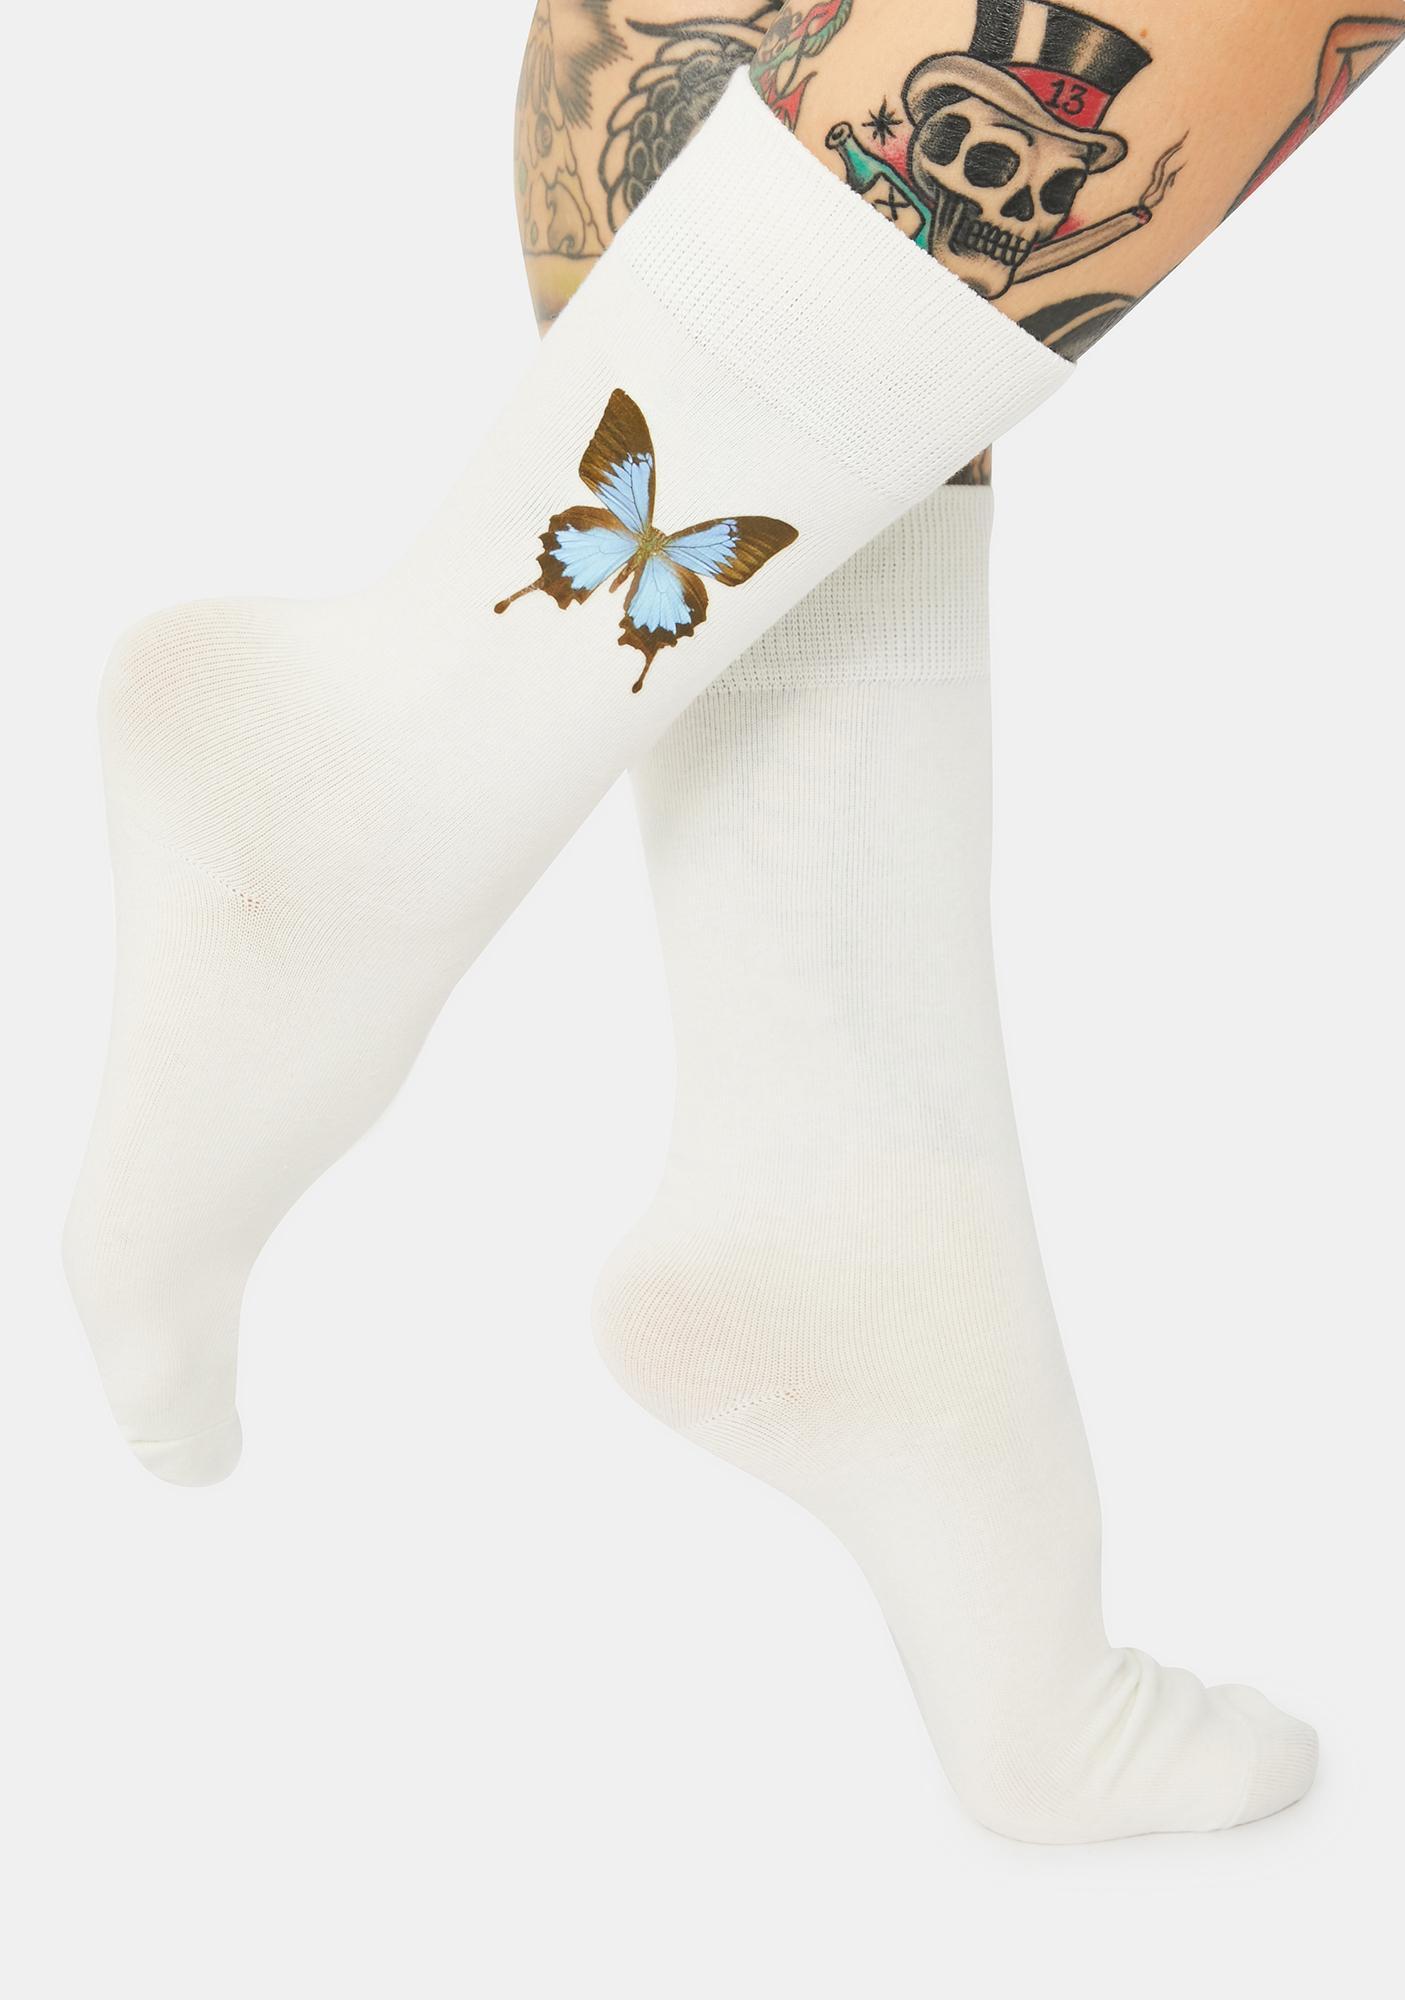 Fantasmic Skies Butterfly Crew Socks